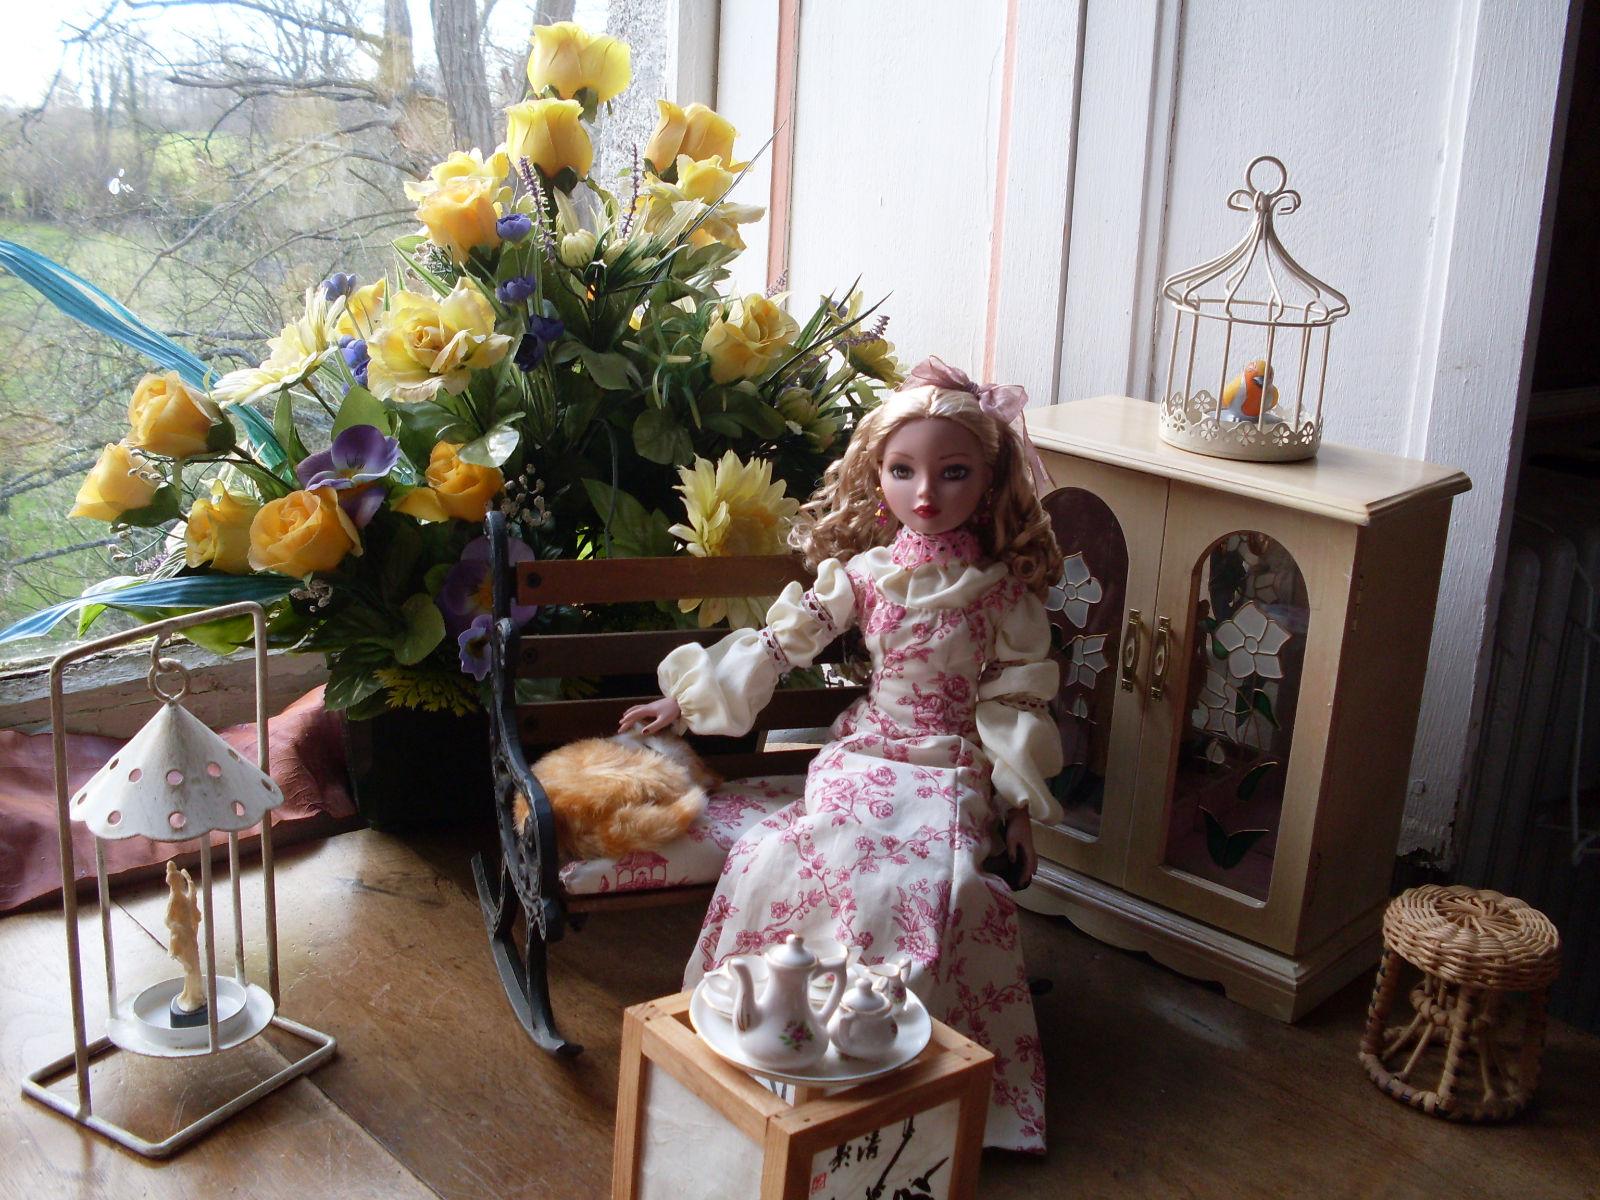 "06 - THEME PHOTO DU MOIS: Mai 2011 ""Ellowyne dans sa Maison"" - Page 2 2010-04%20Jardin%20d%27hiver%20022"